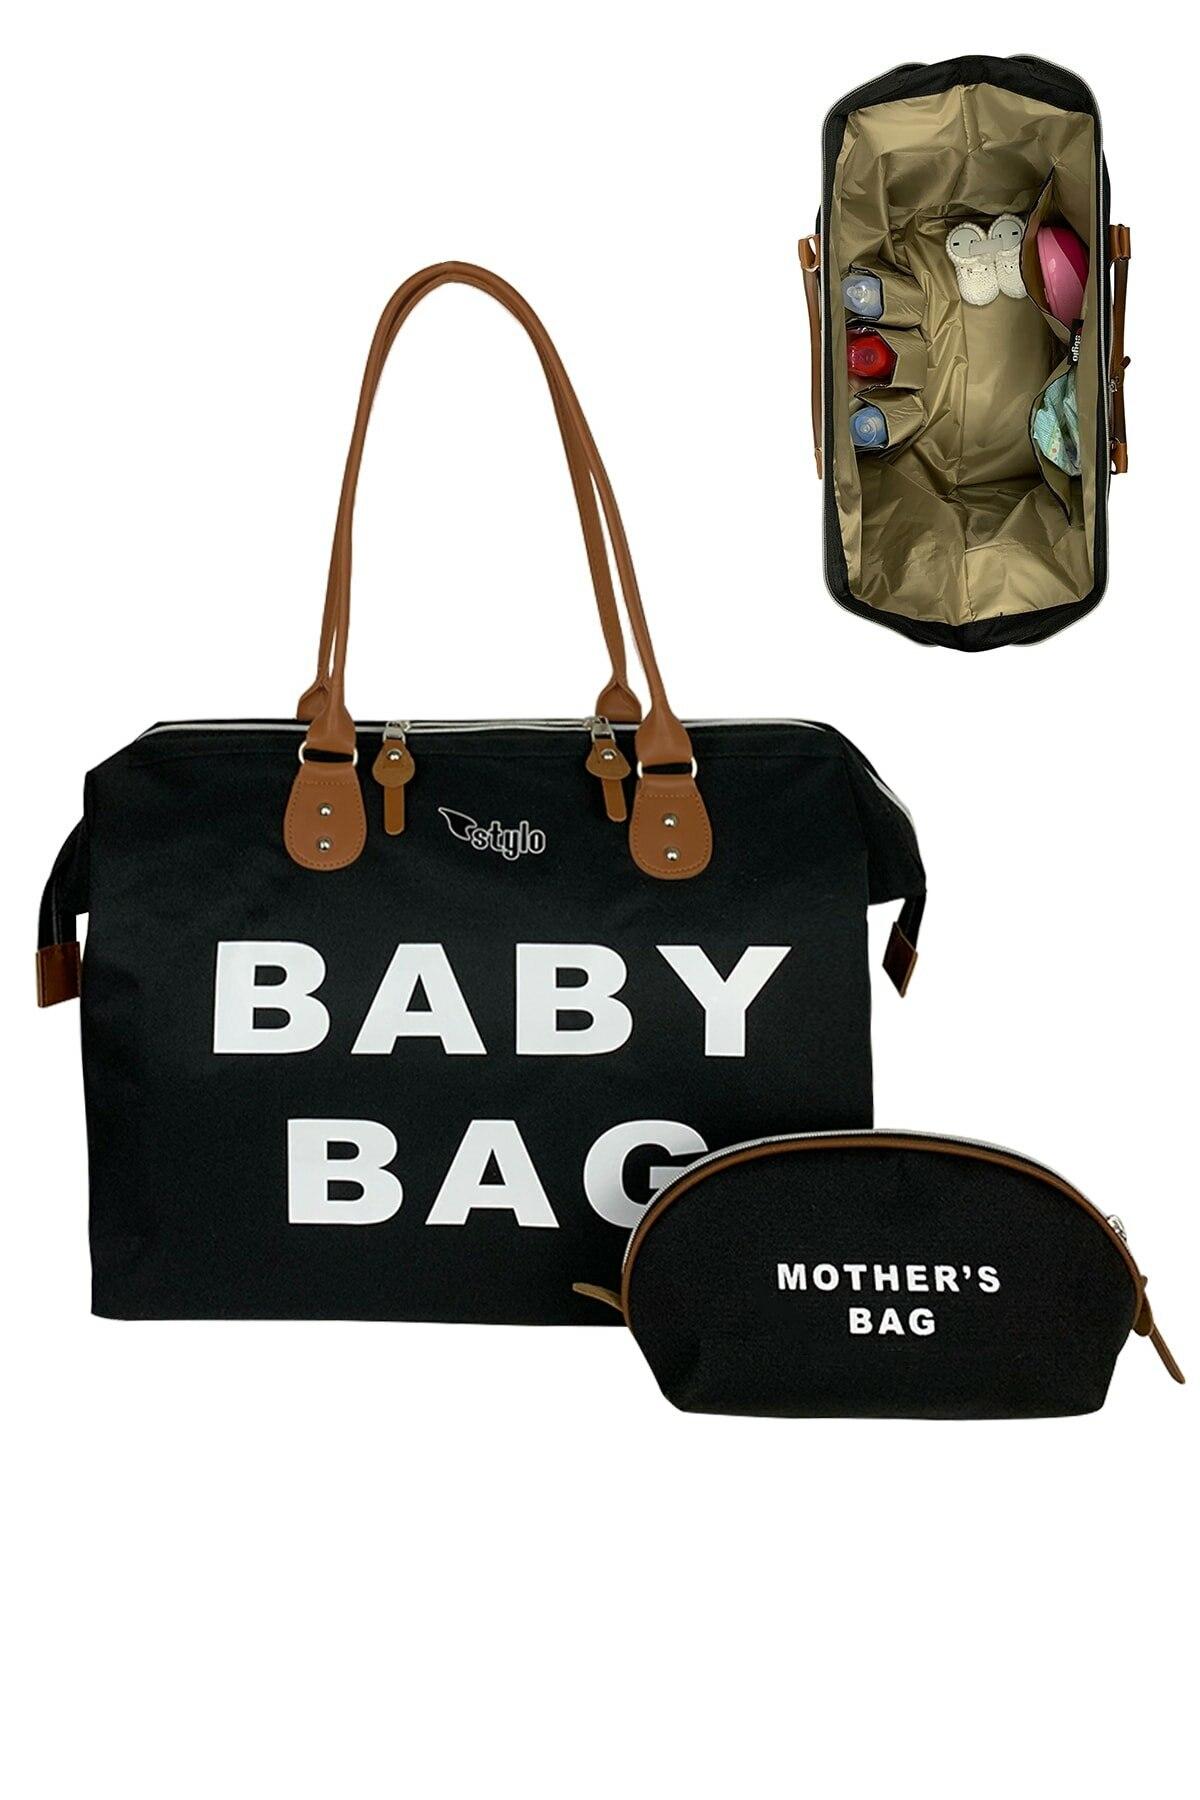 Stylo حقيبة أطفال حقيبة الأم رعاية الطفل للمرأة-أسود ، حامل ، سعة كبيرة ، جودة ، عملية ، موضة ، ماركة فاخرة